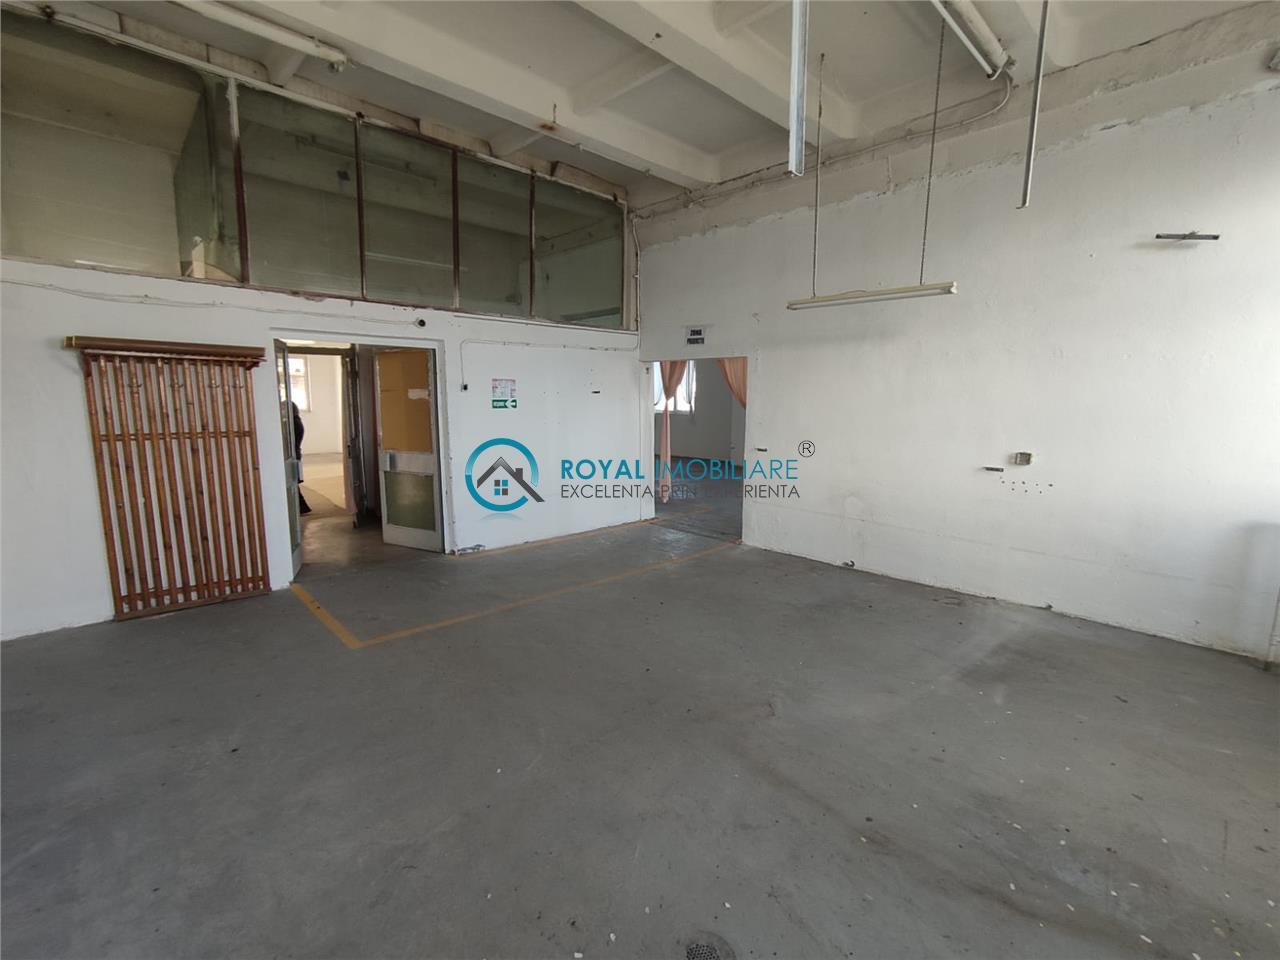 Royal Imobiliare   Inchiriere spatiu industrial zona Vest